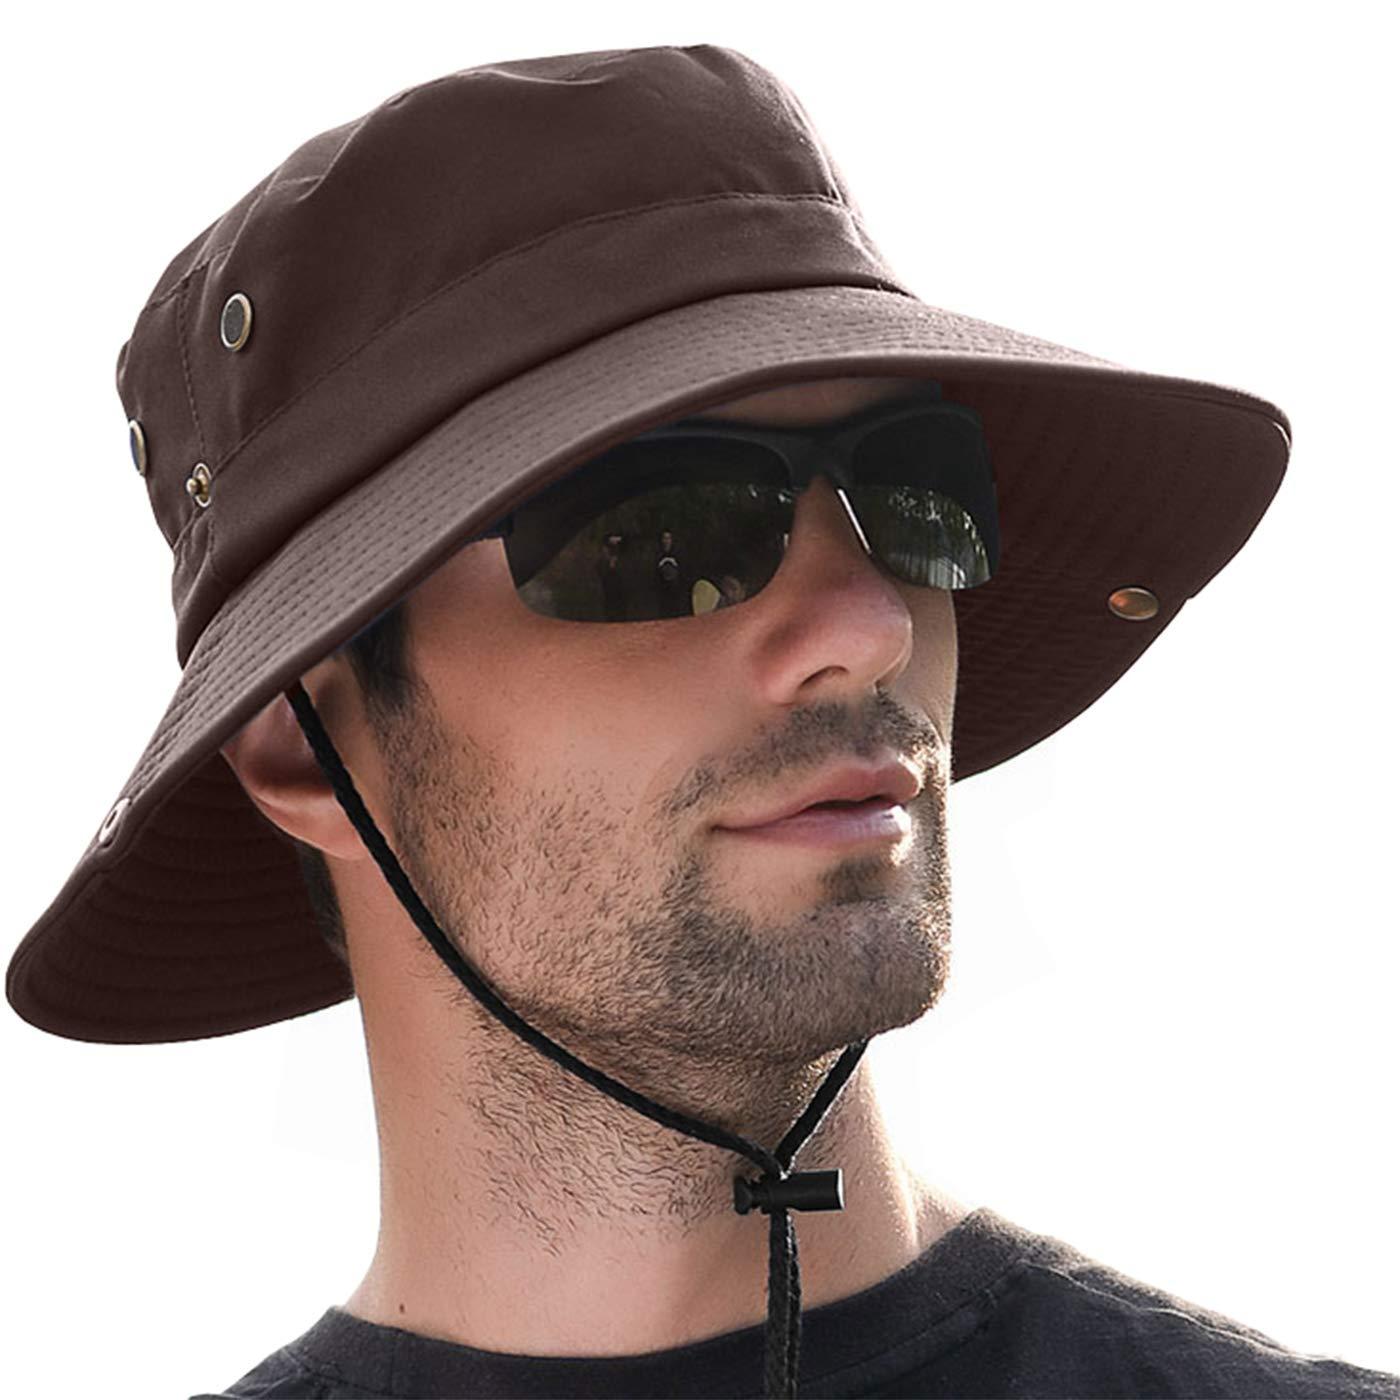 LCZTN Boonie Sun Hat for Men UPF 50+ UV Protection Wide Brim Fishing Cap